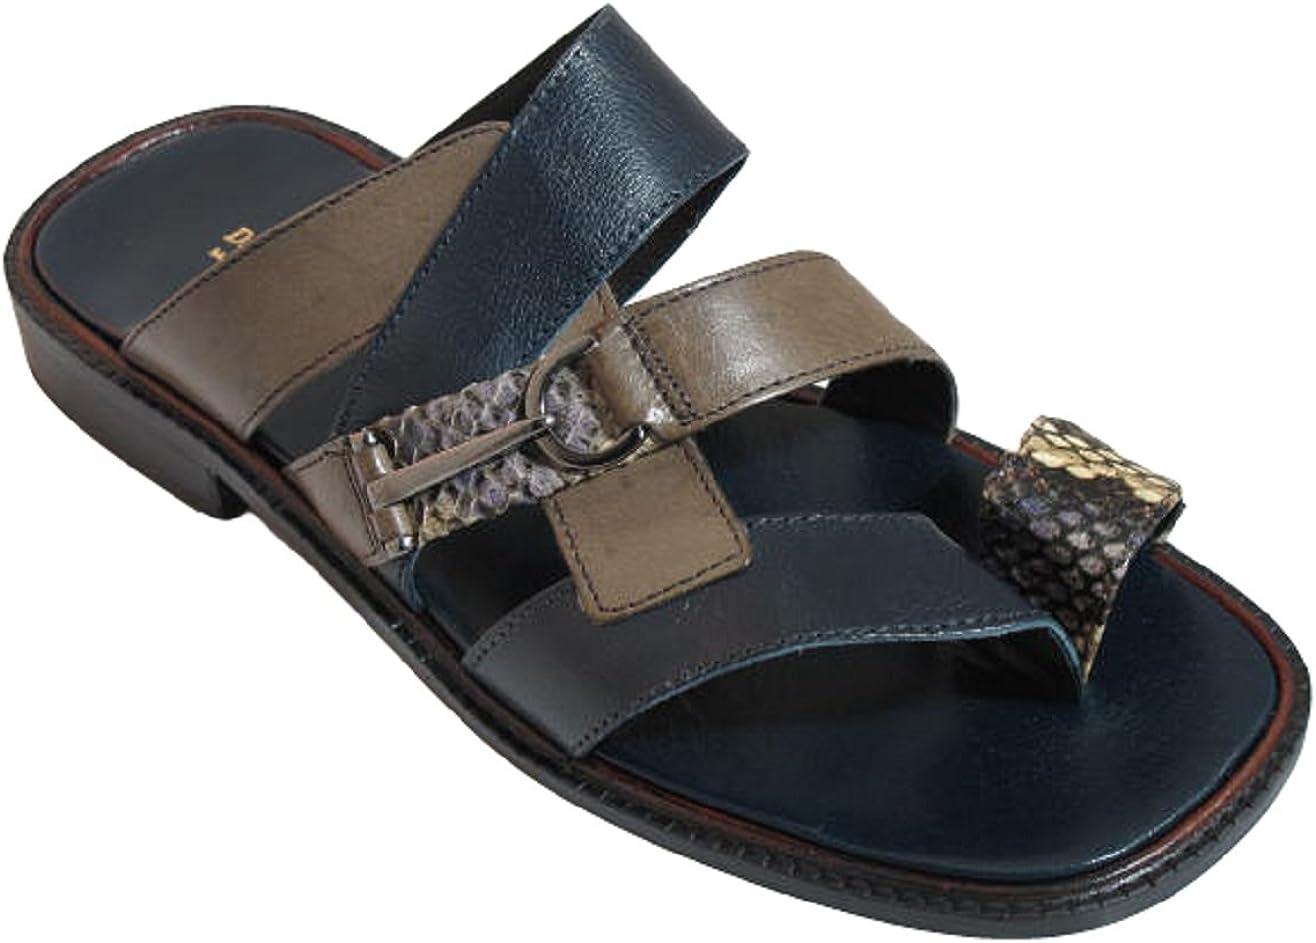 Italian Dressy/Casual Sandals   Sandals